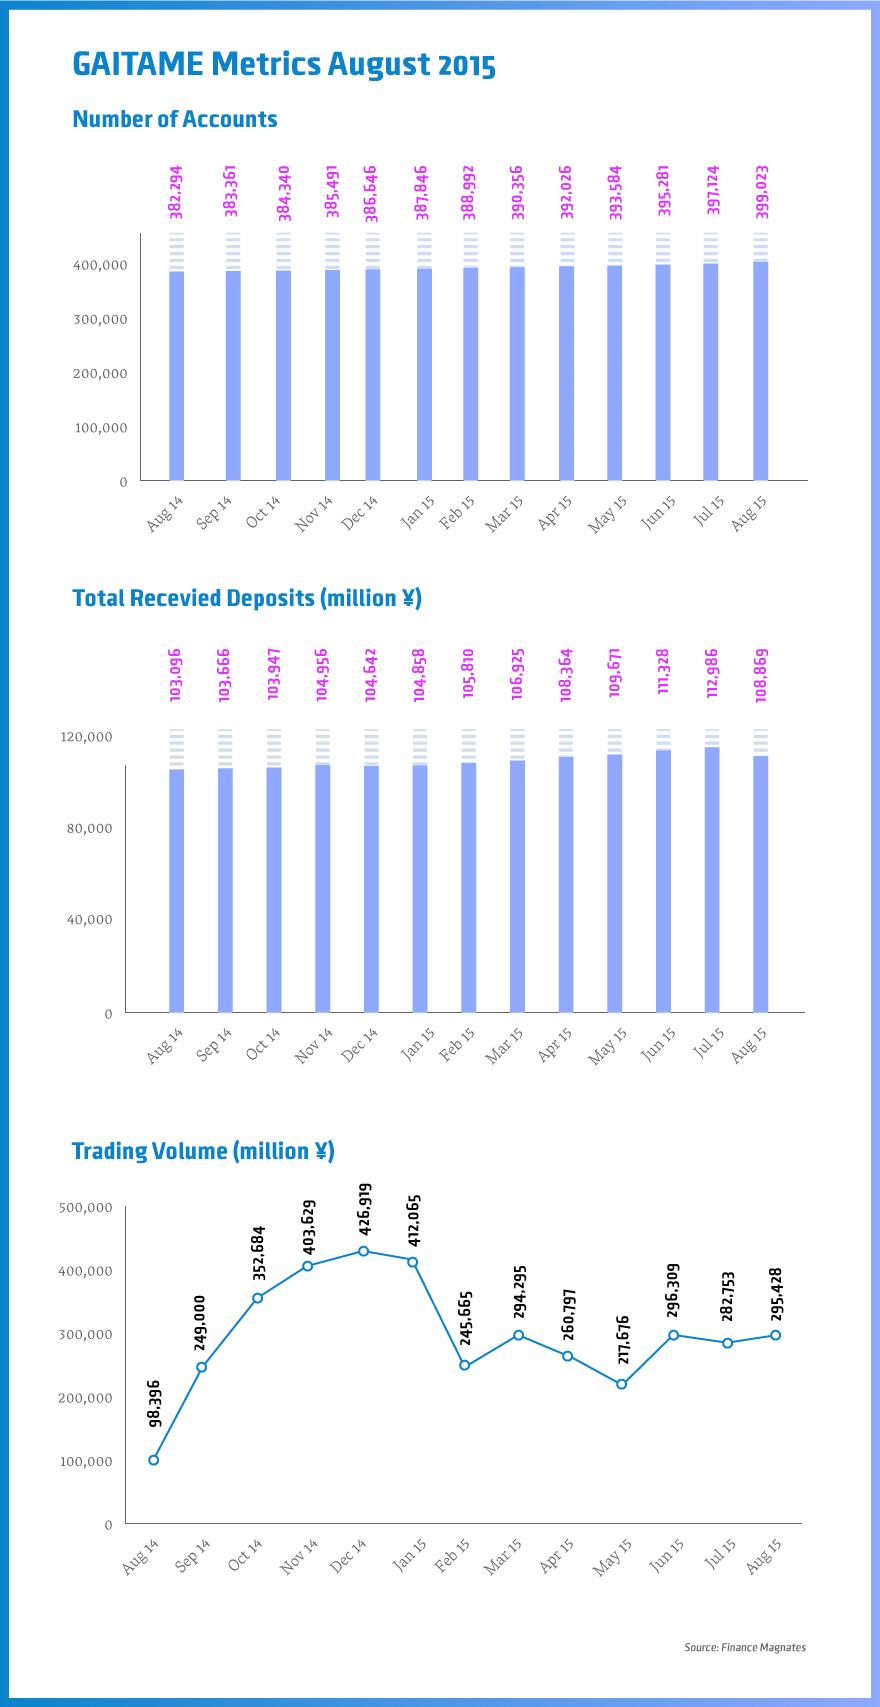 Gaitame-metrics-august-2015 (1)